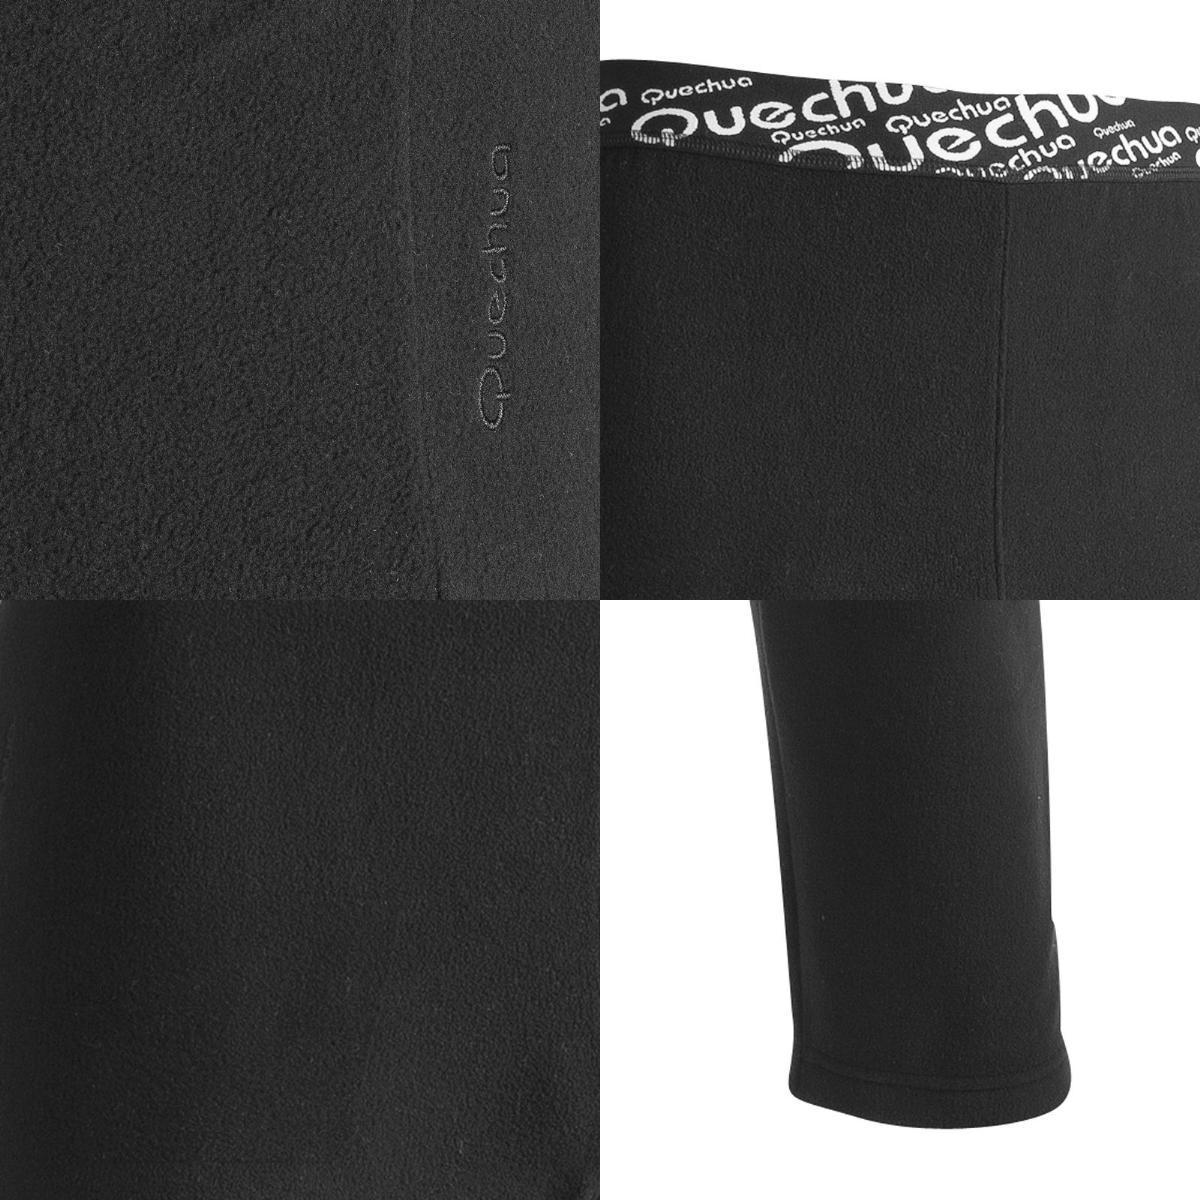 Quechua(keshua)FORCLAZ 50 fleece紧凑的裤子人M BLACK 8228616-1562132